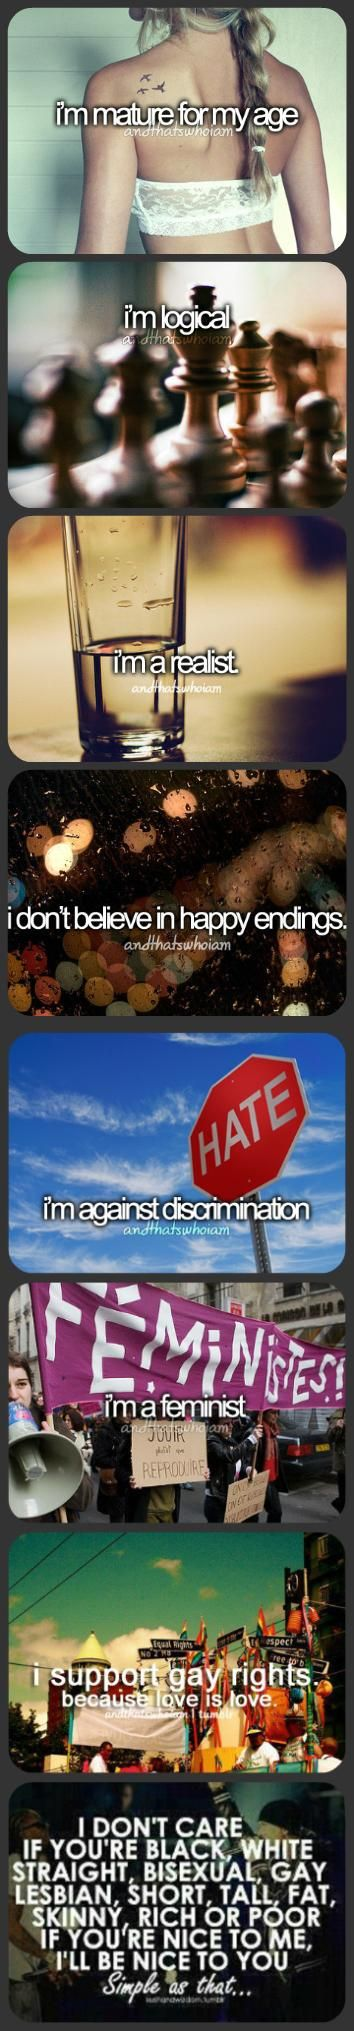 mature happy ending